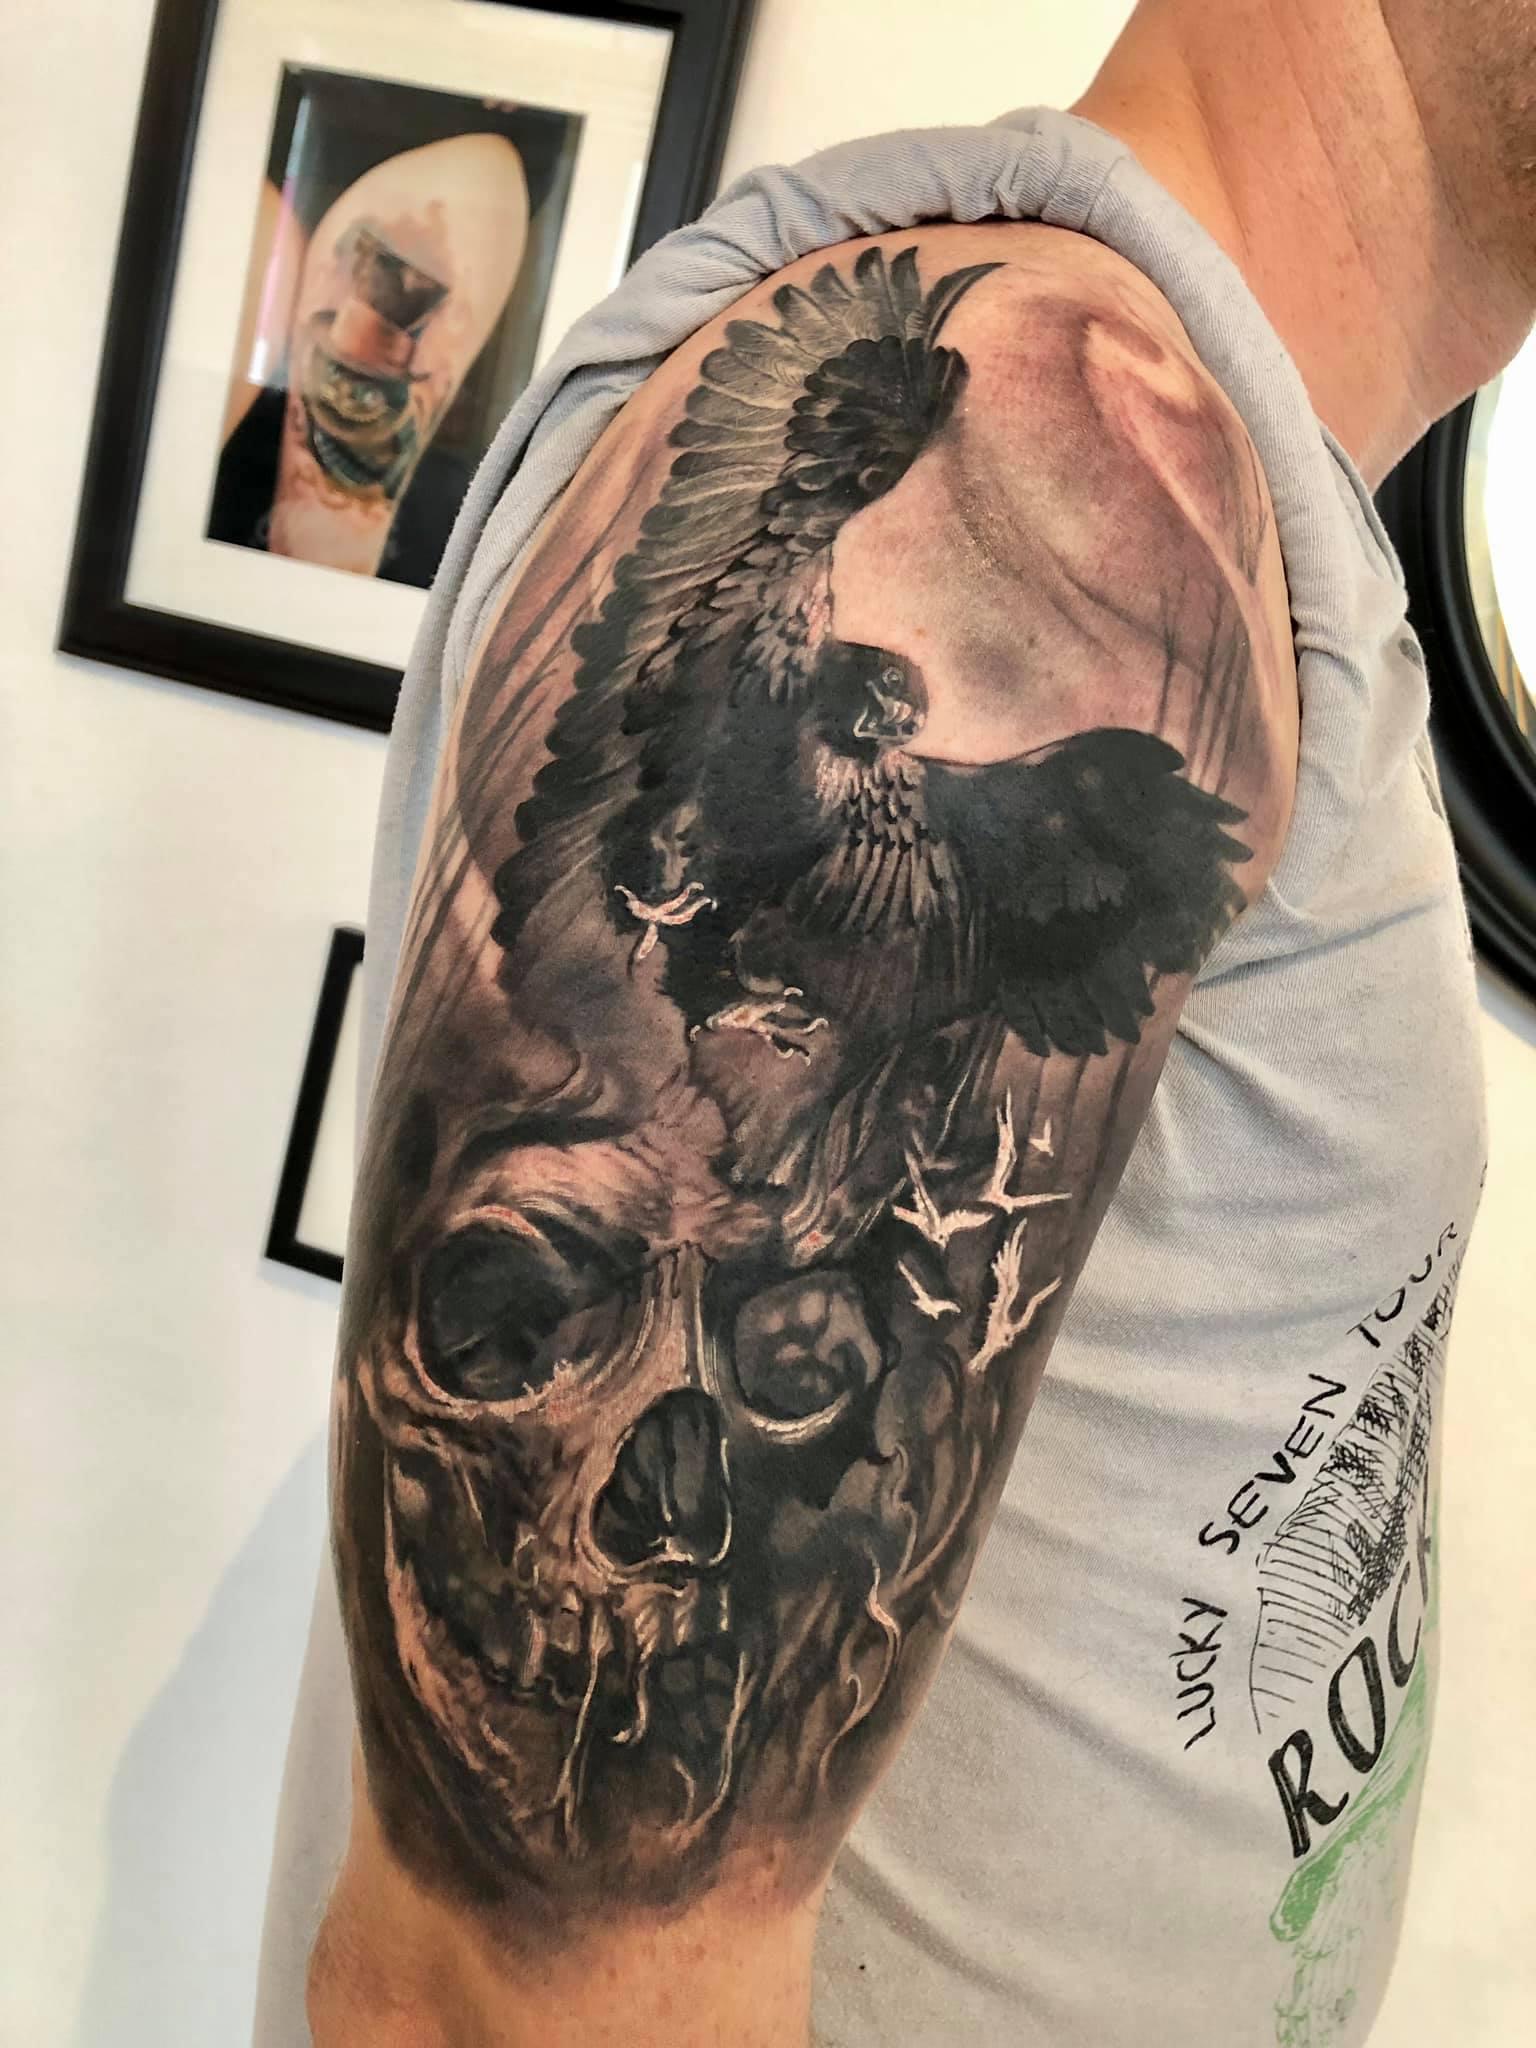 Maui Meherzi - Opus Magnum Tattoo Studio Wien - Fotorealismus - Skull